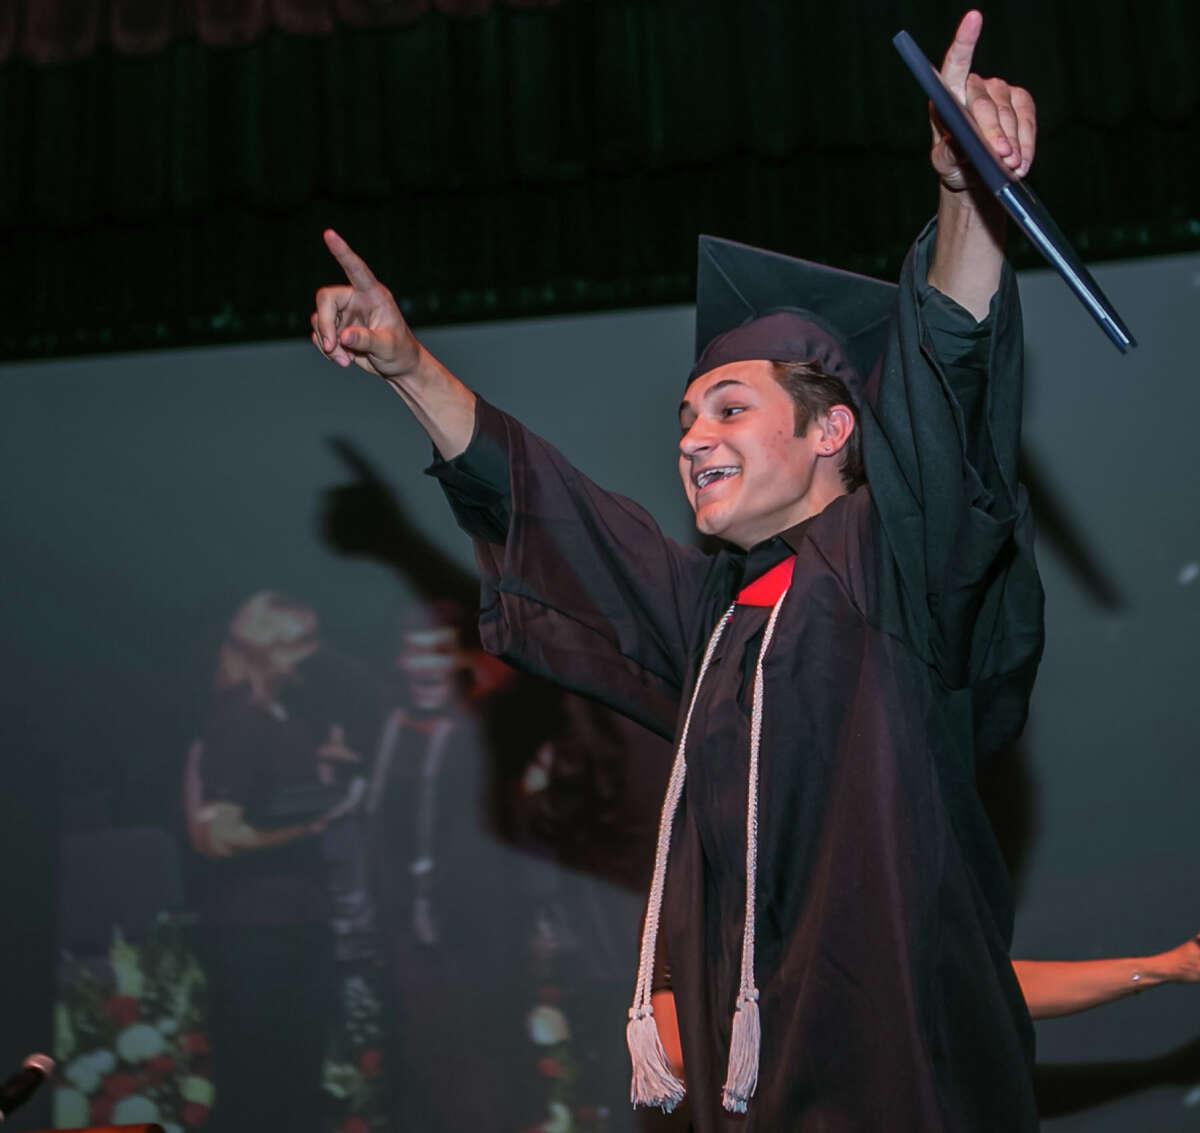 (John Vanacore/For Hearst Connecticut Media) Platt Tech Graduate William Esposito celebrates after receiving his diploma Thursday evening.